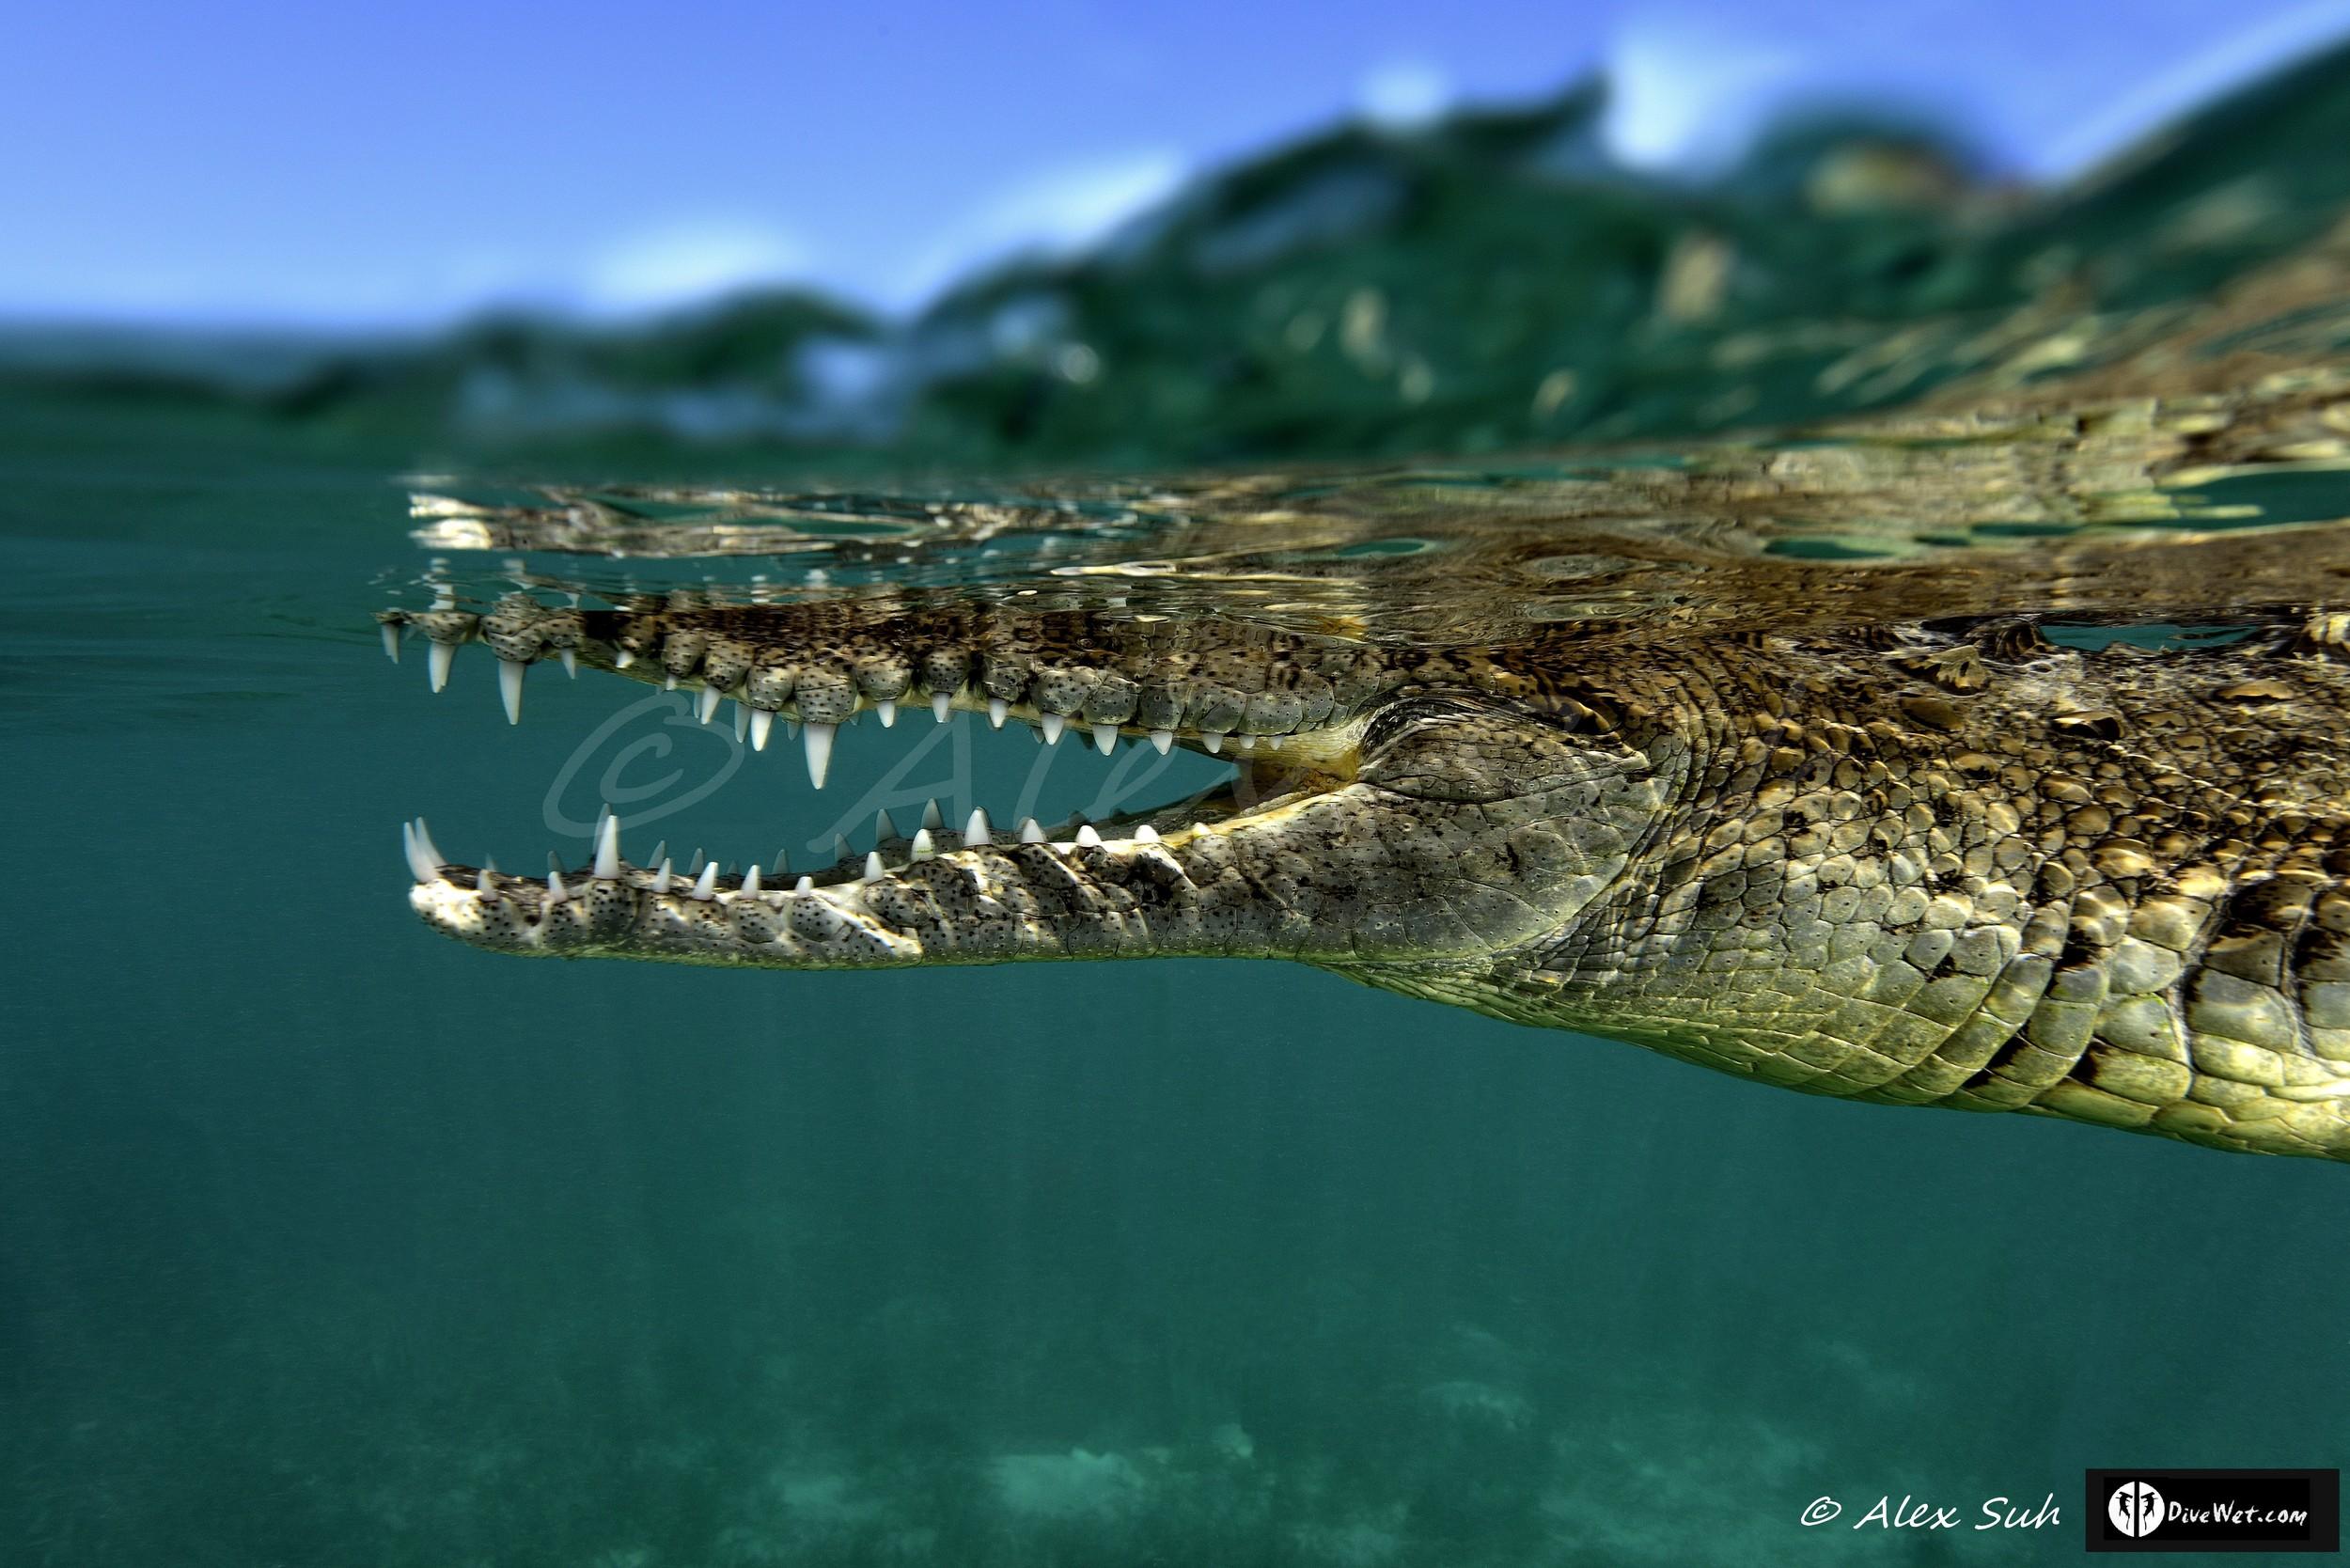 Over Under Image of American Crocodile (Crocodylus acutus) swimming pass me